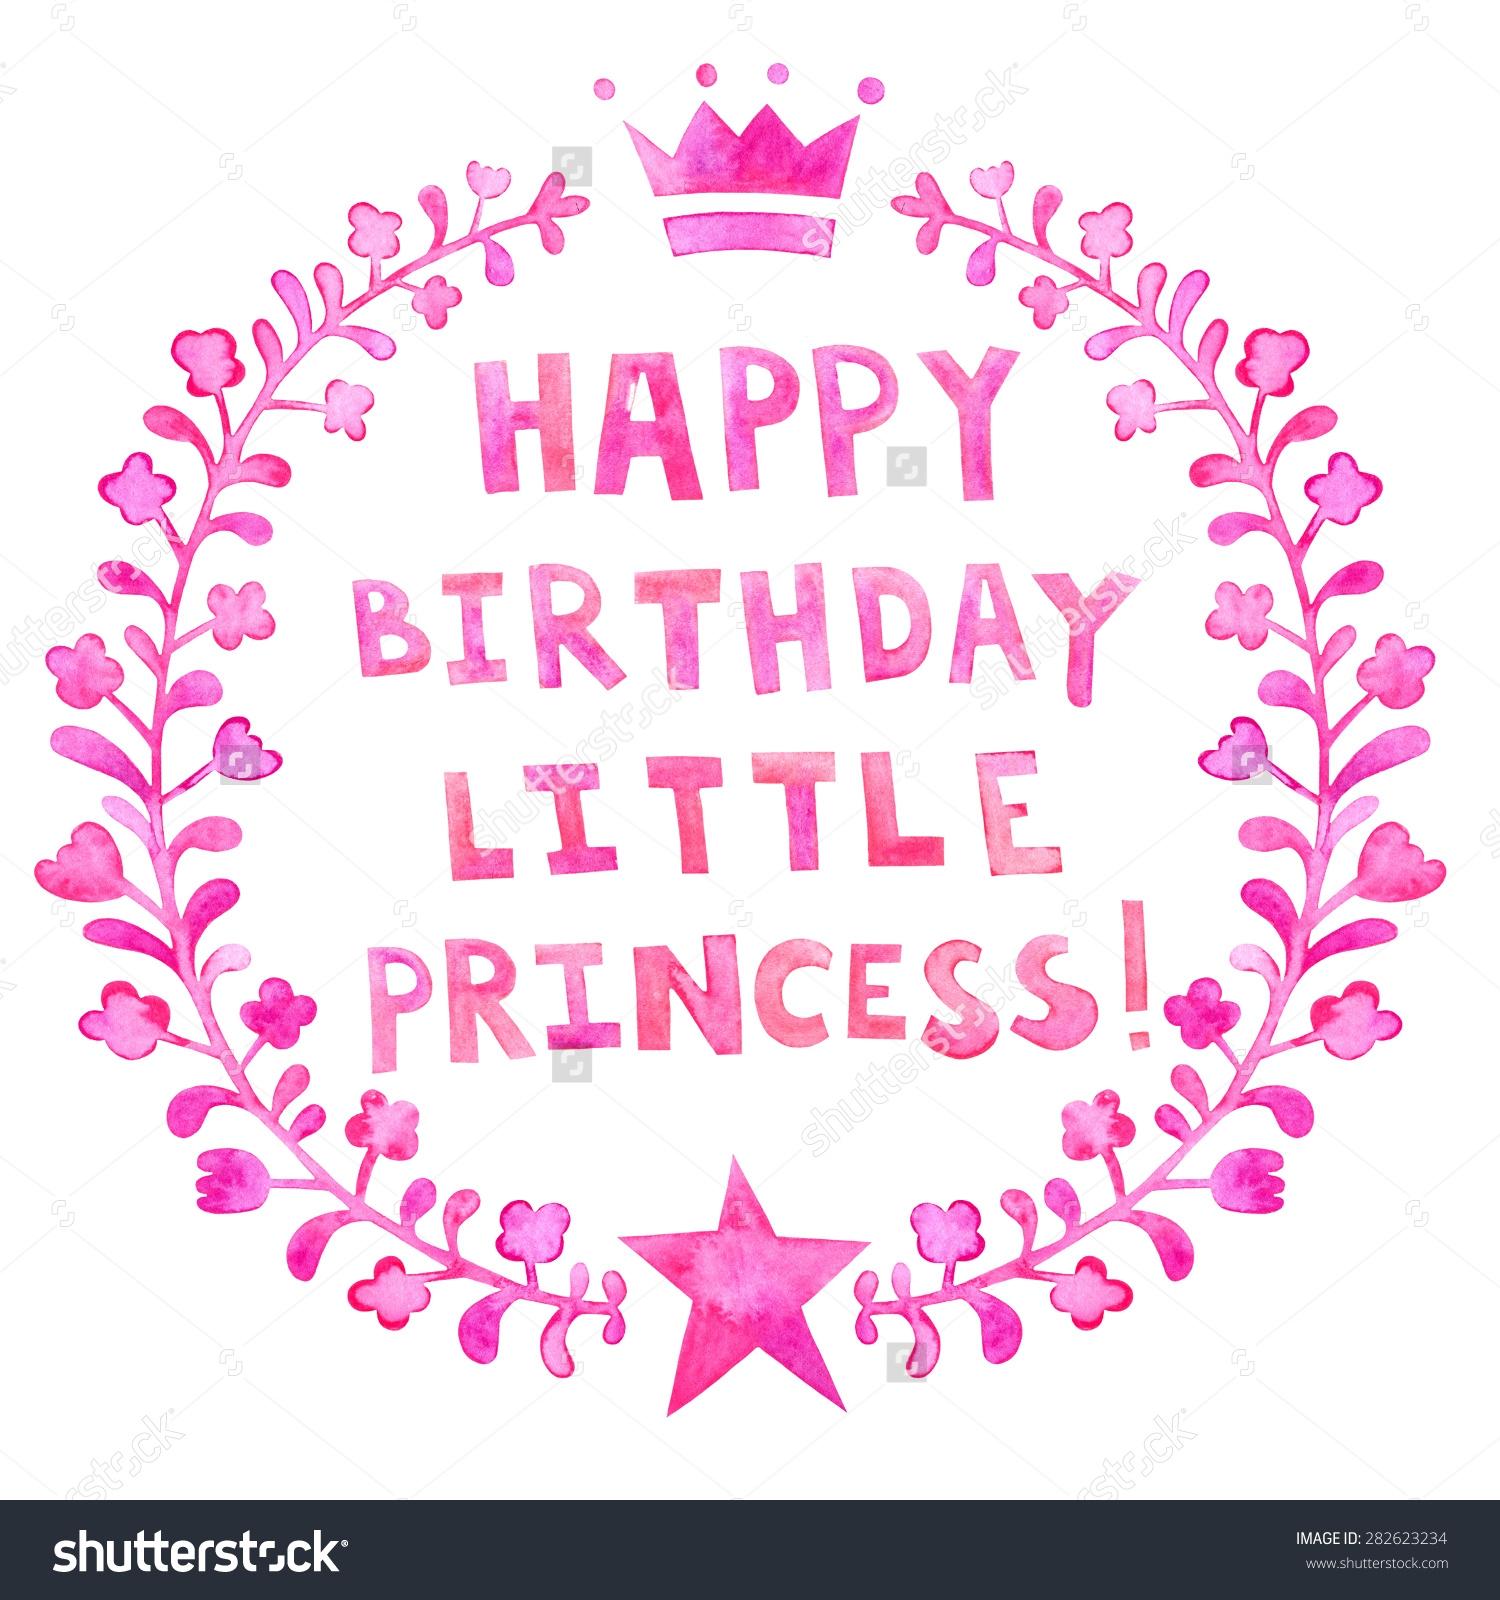 Birthday clipart princess Princess Happy Birthday Clipart Happy